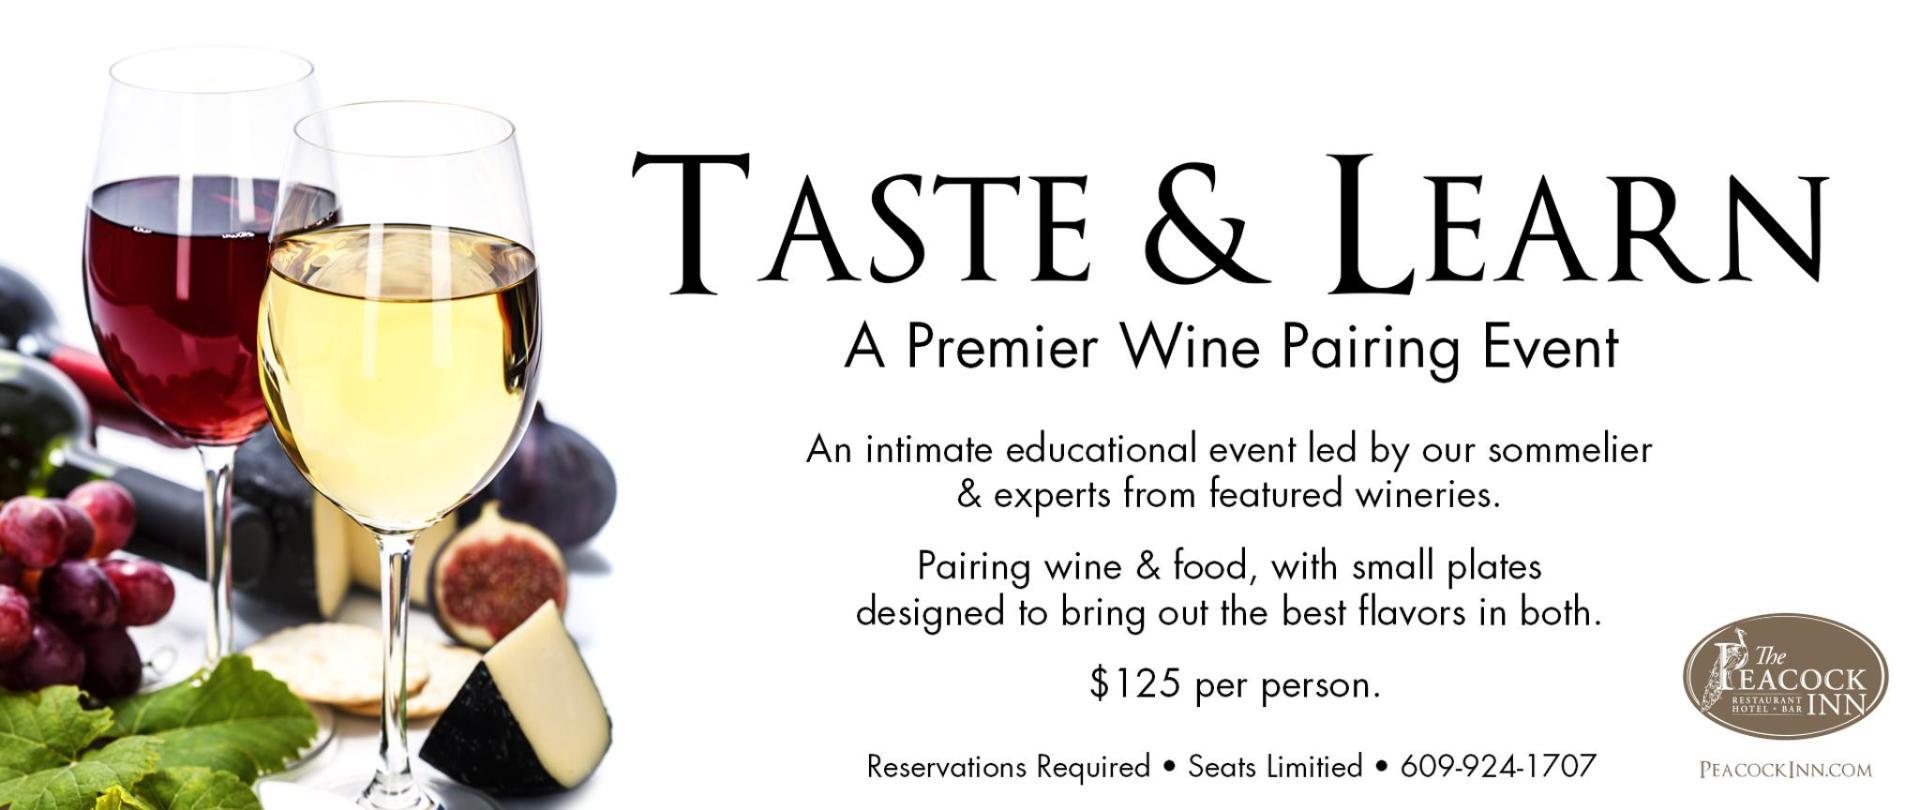 WinePairEvent_Webpage2019.jpg